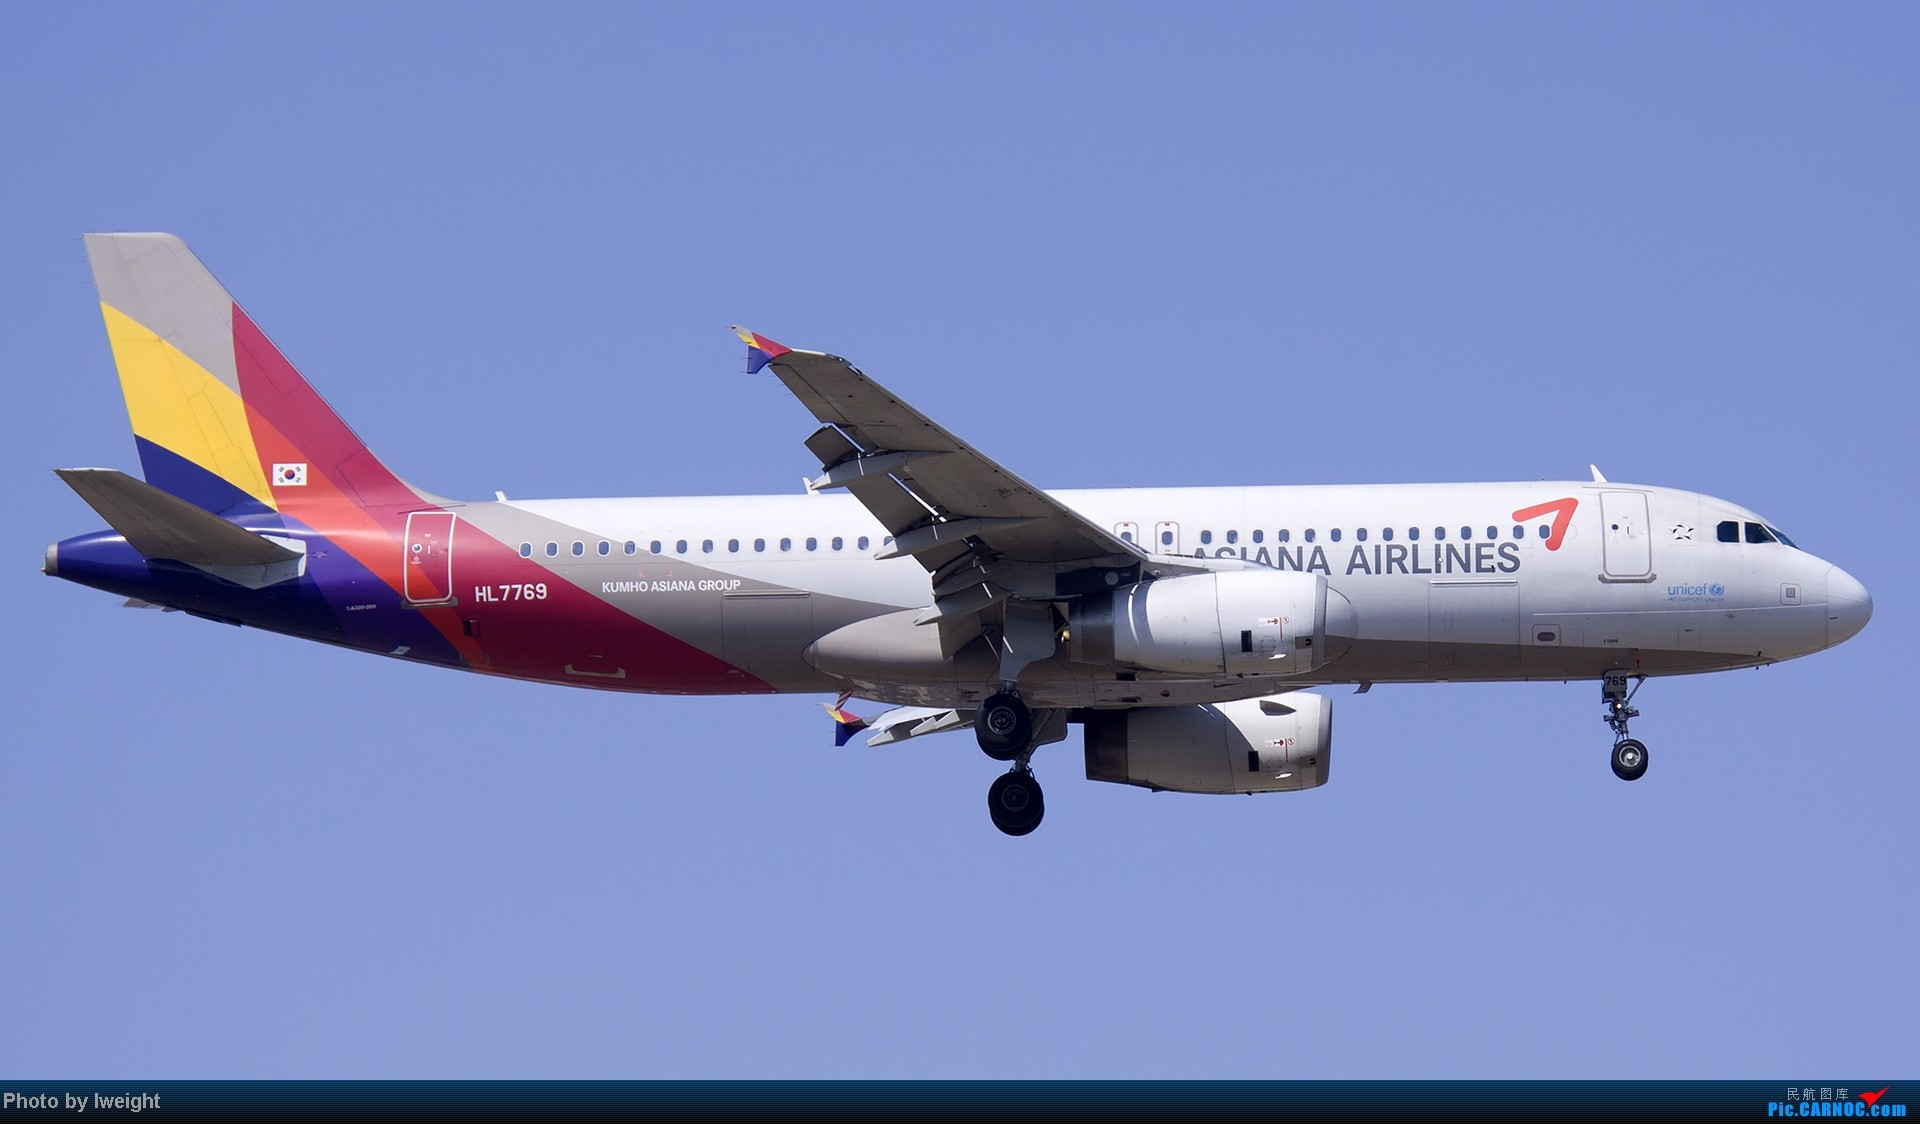 Re:[原创]北京难得的好天气,收获多种机型和彩绘,遗憾的是再次错过卡航巴塞罗那彩绘 AIRBUS A320-200 HL7769 中国北京首都机场